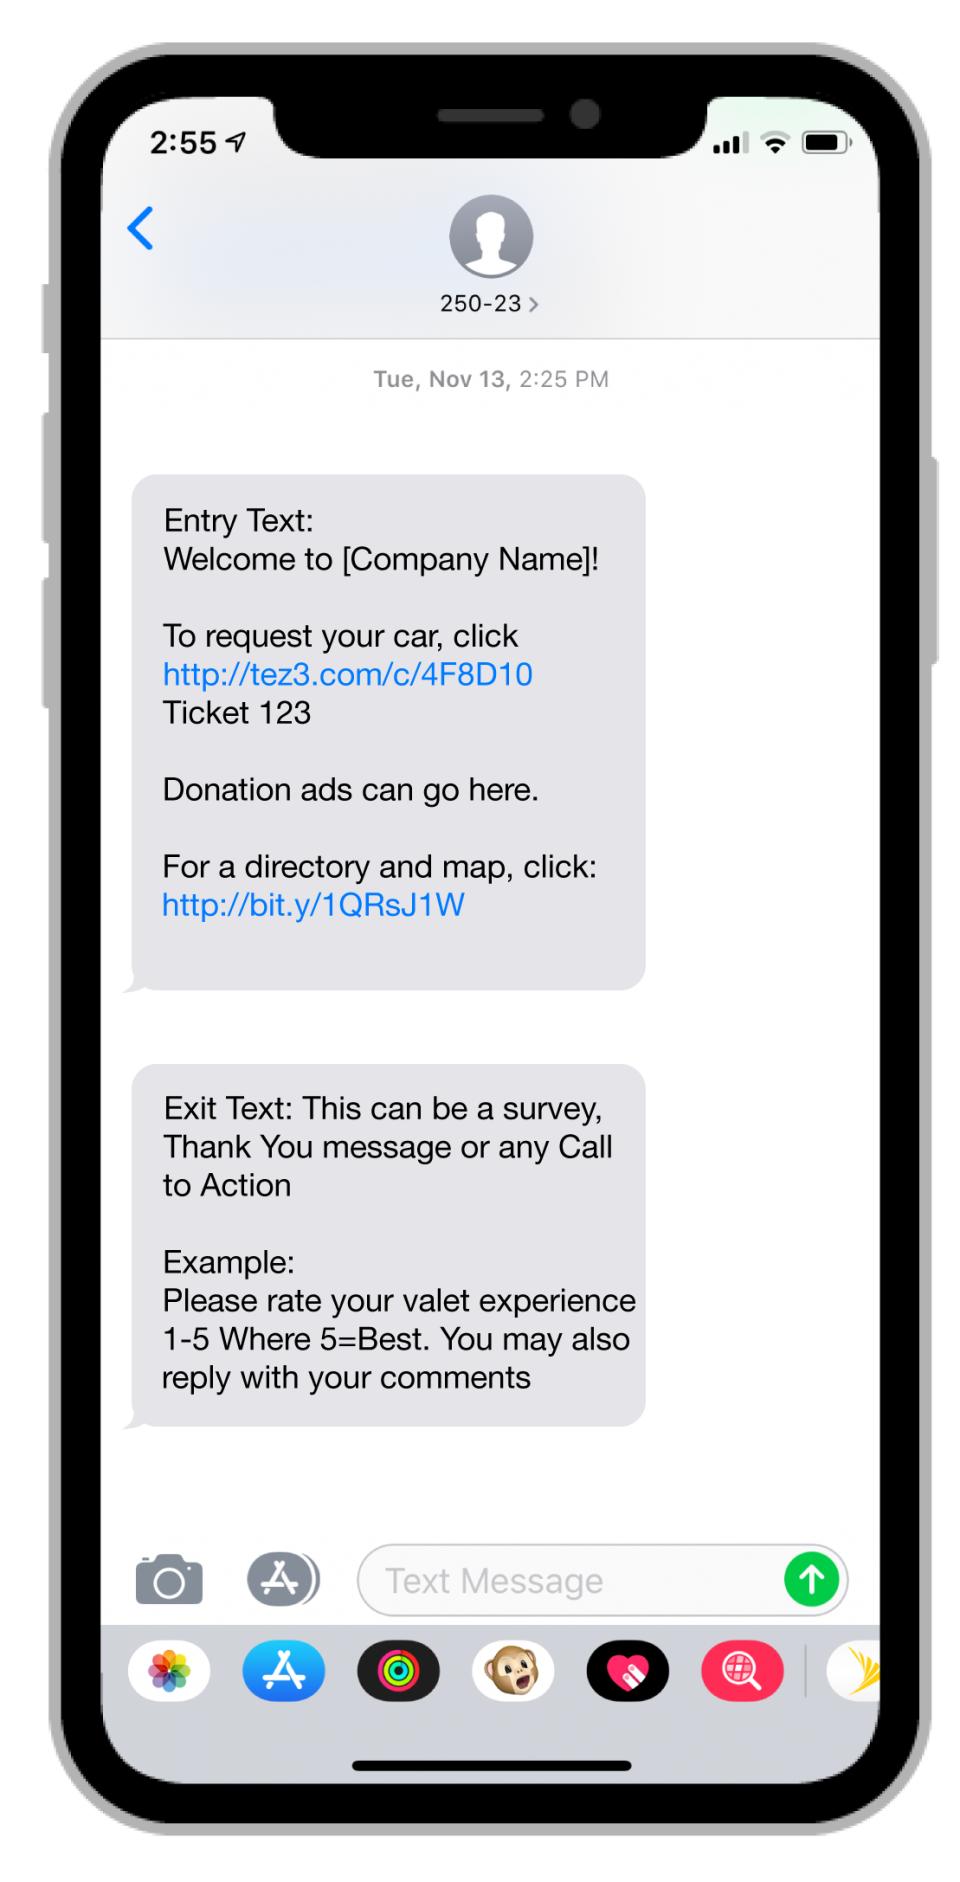 SMS Valet screenshot: SMS Valet welcome messages